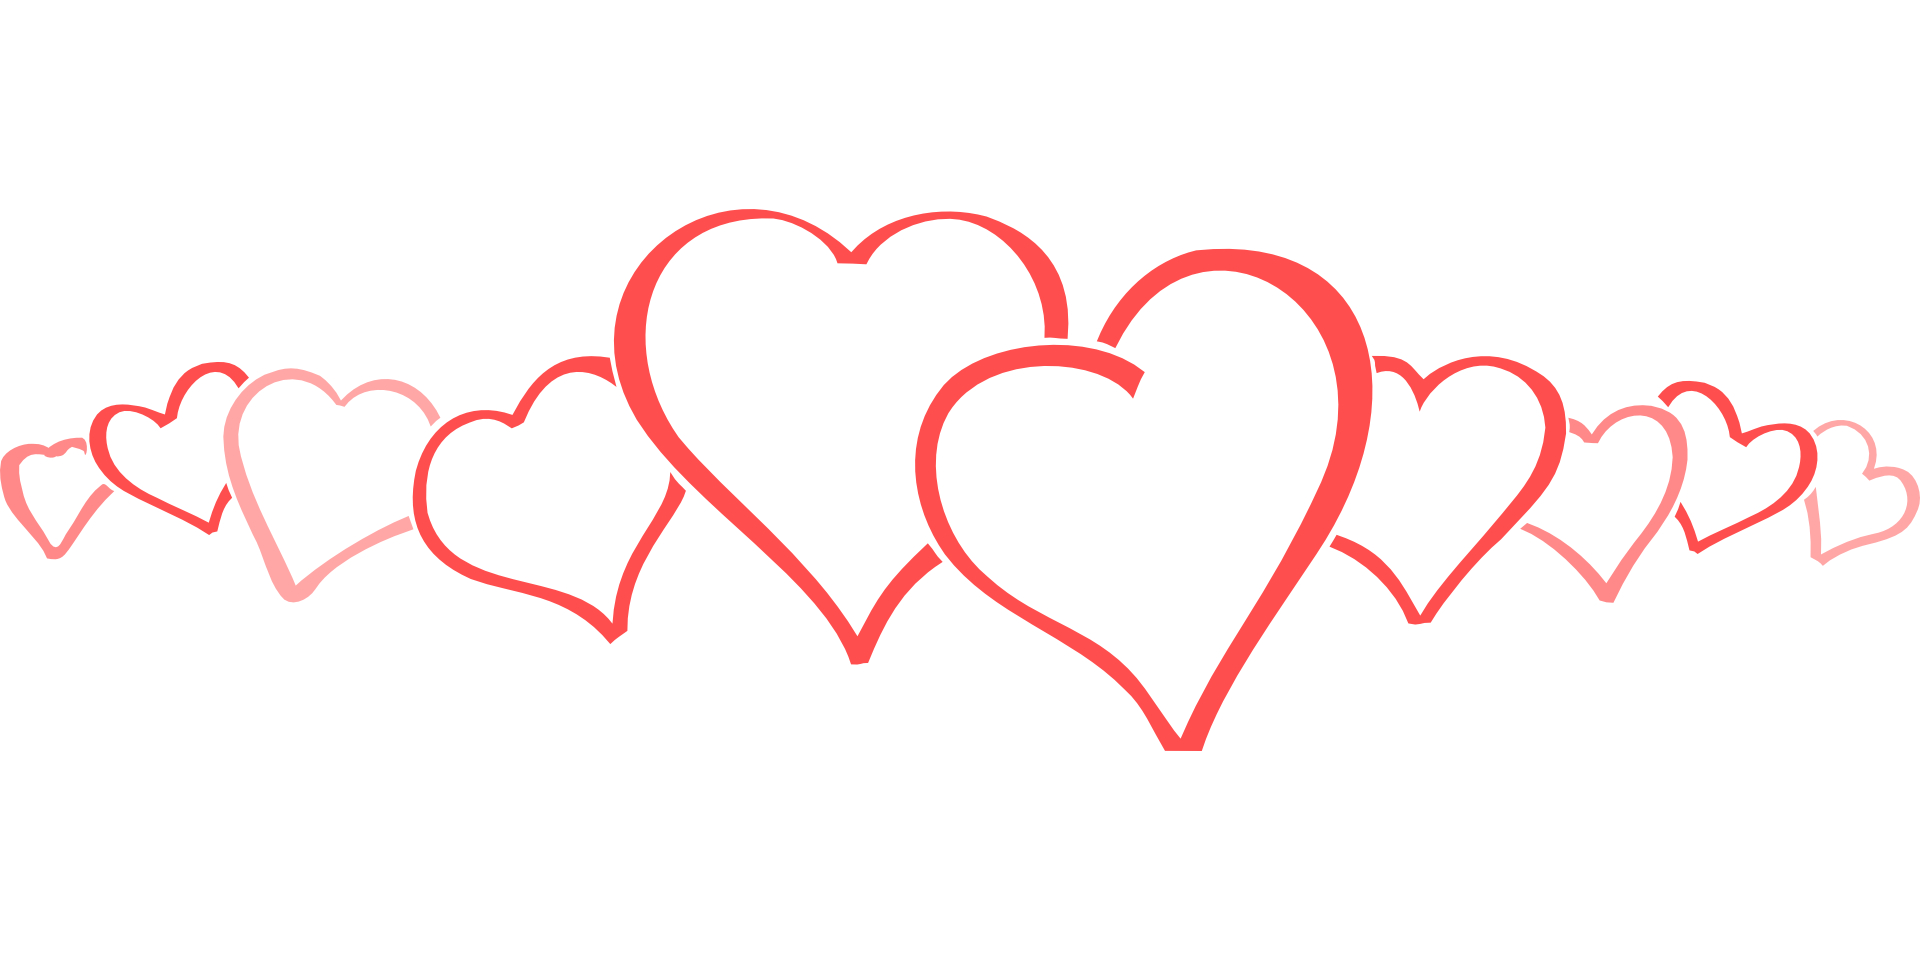 Heart outline pattern vector